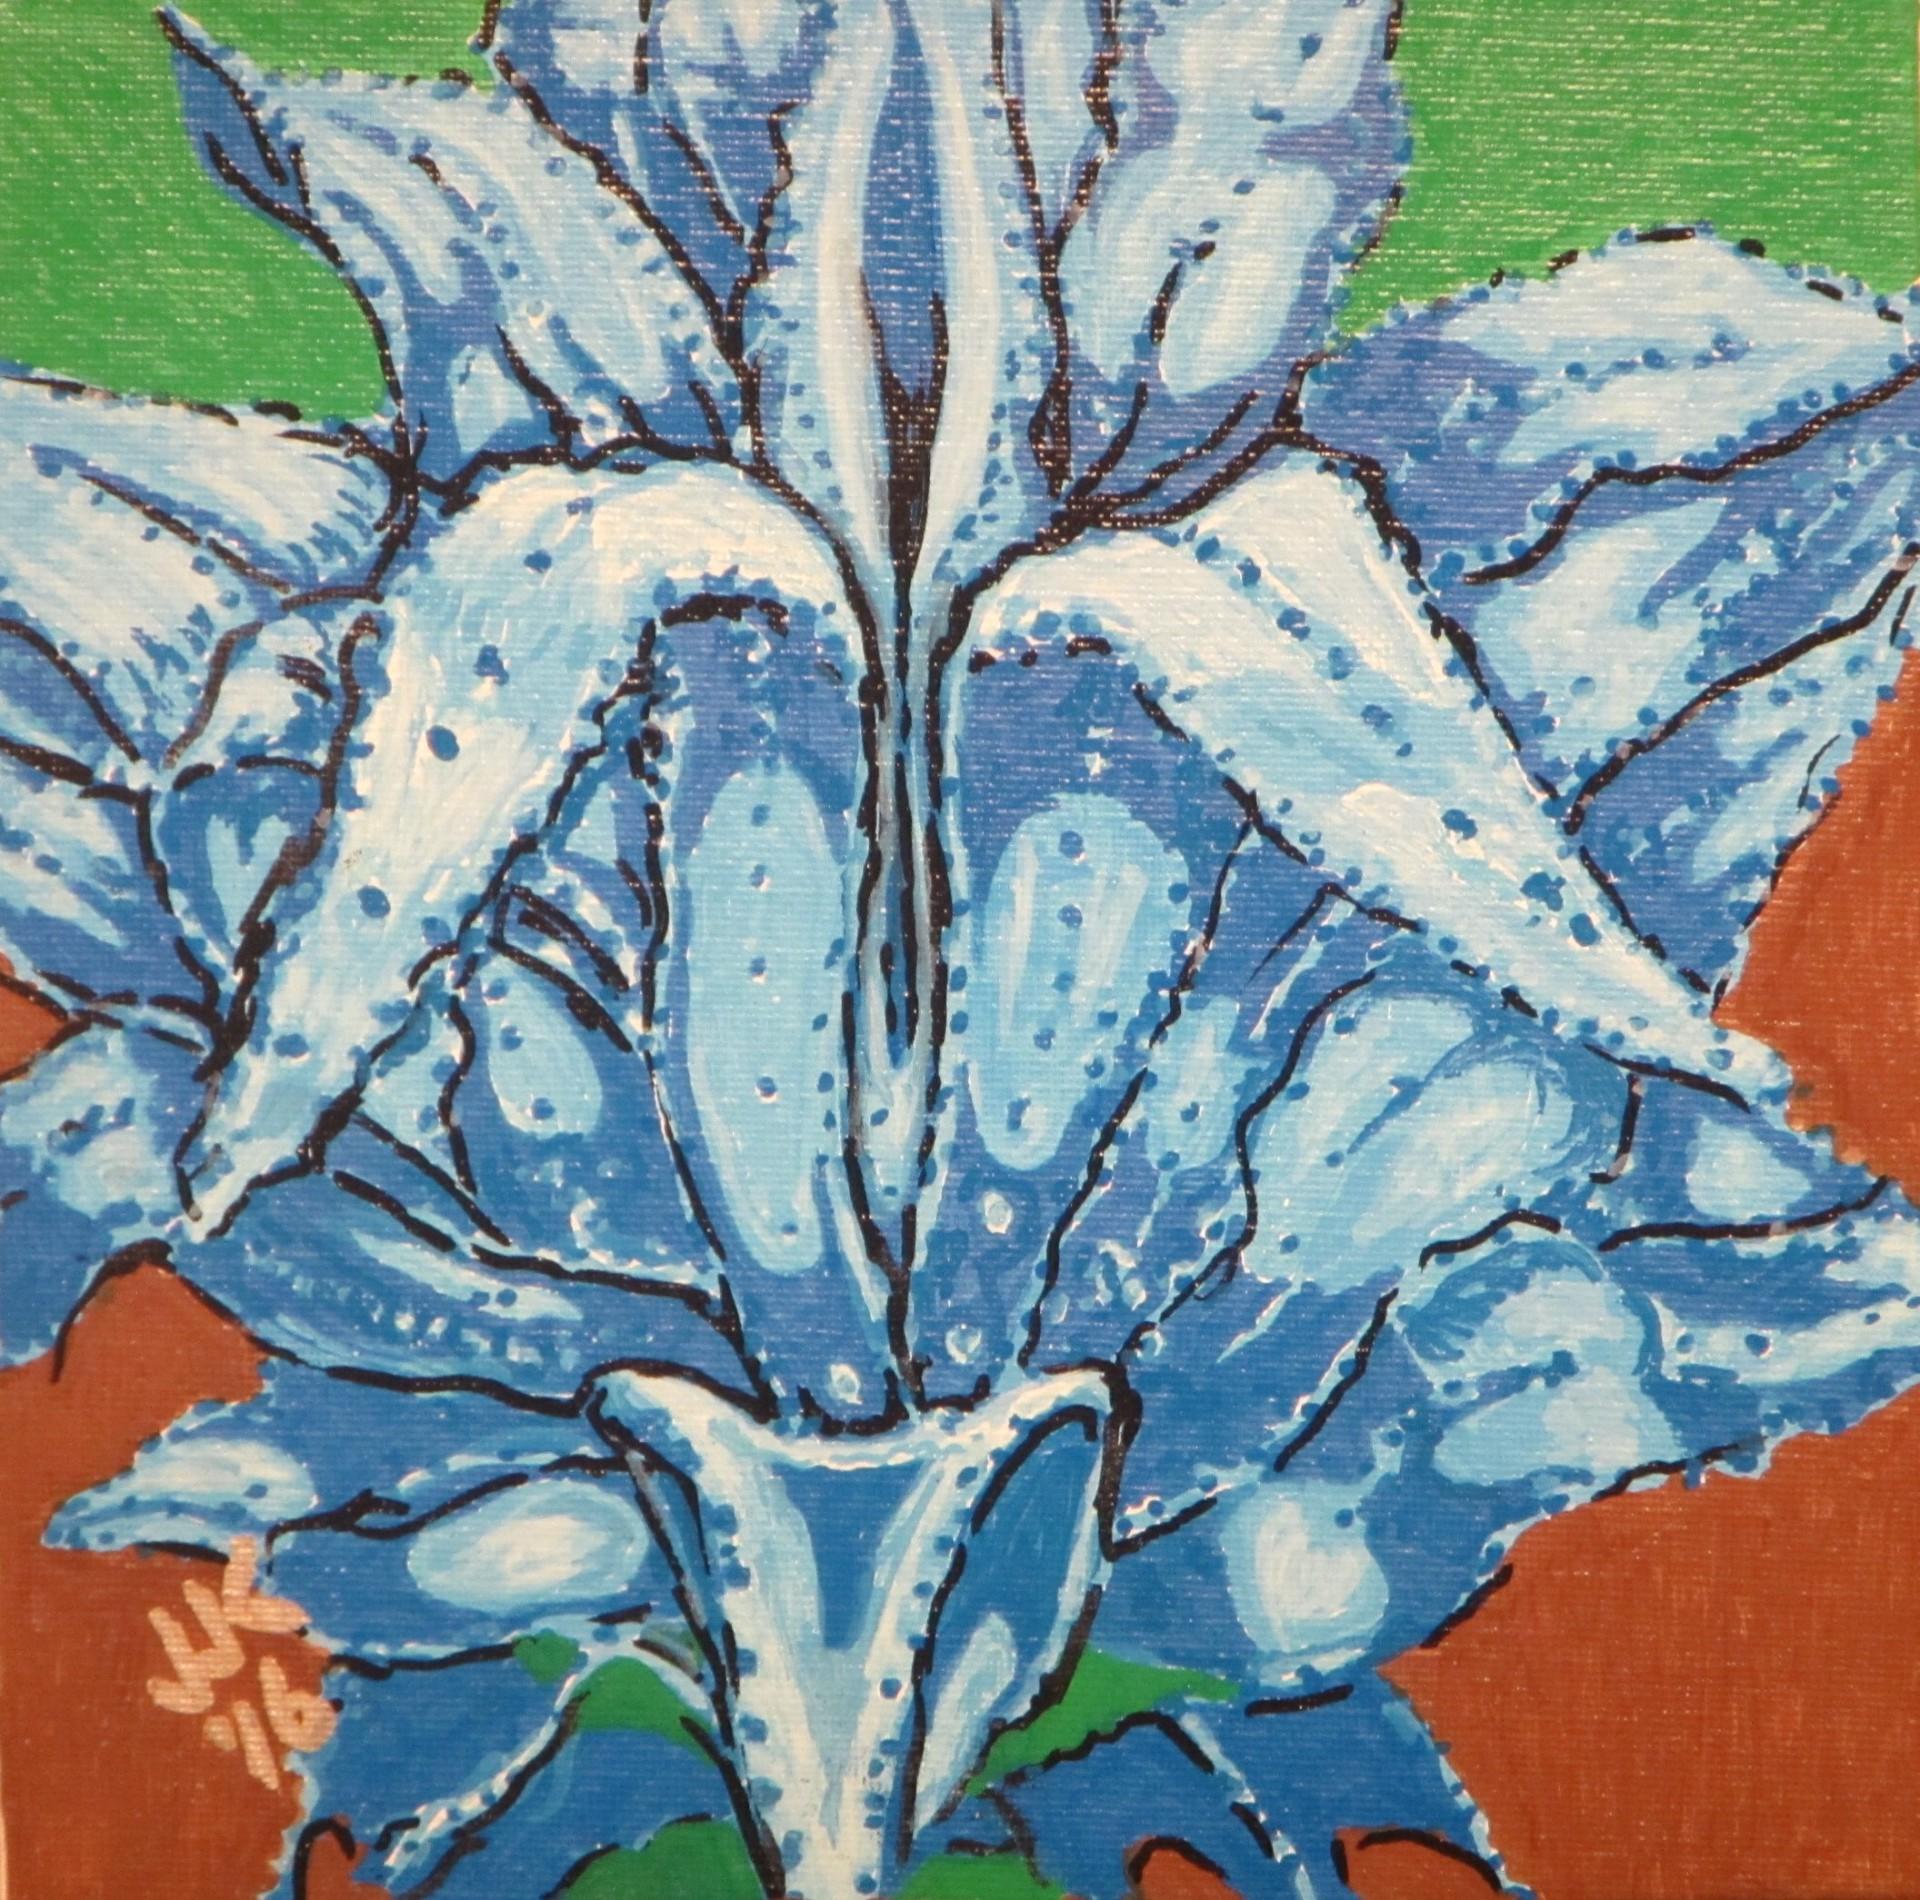 Blue Agave cactus.